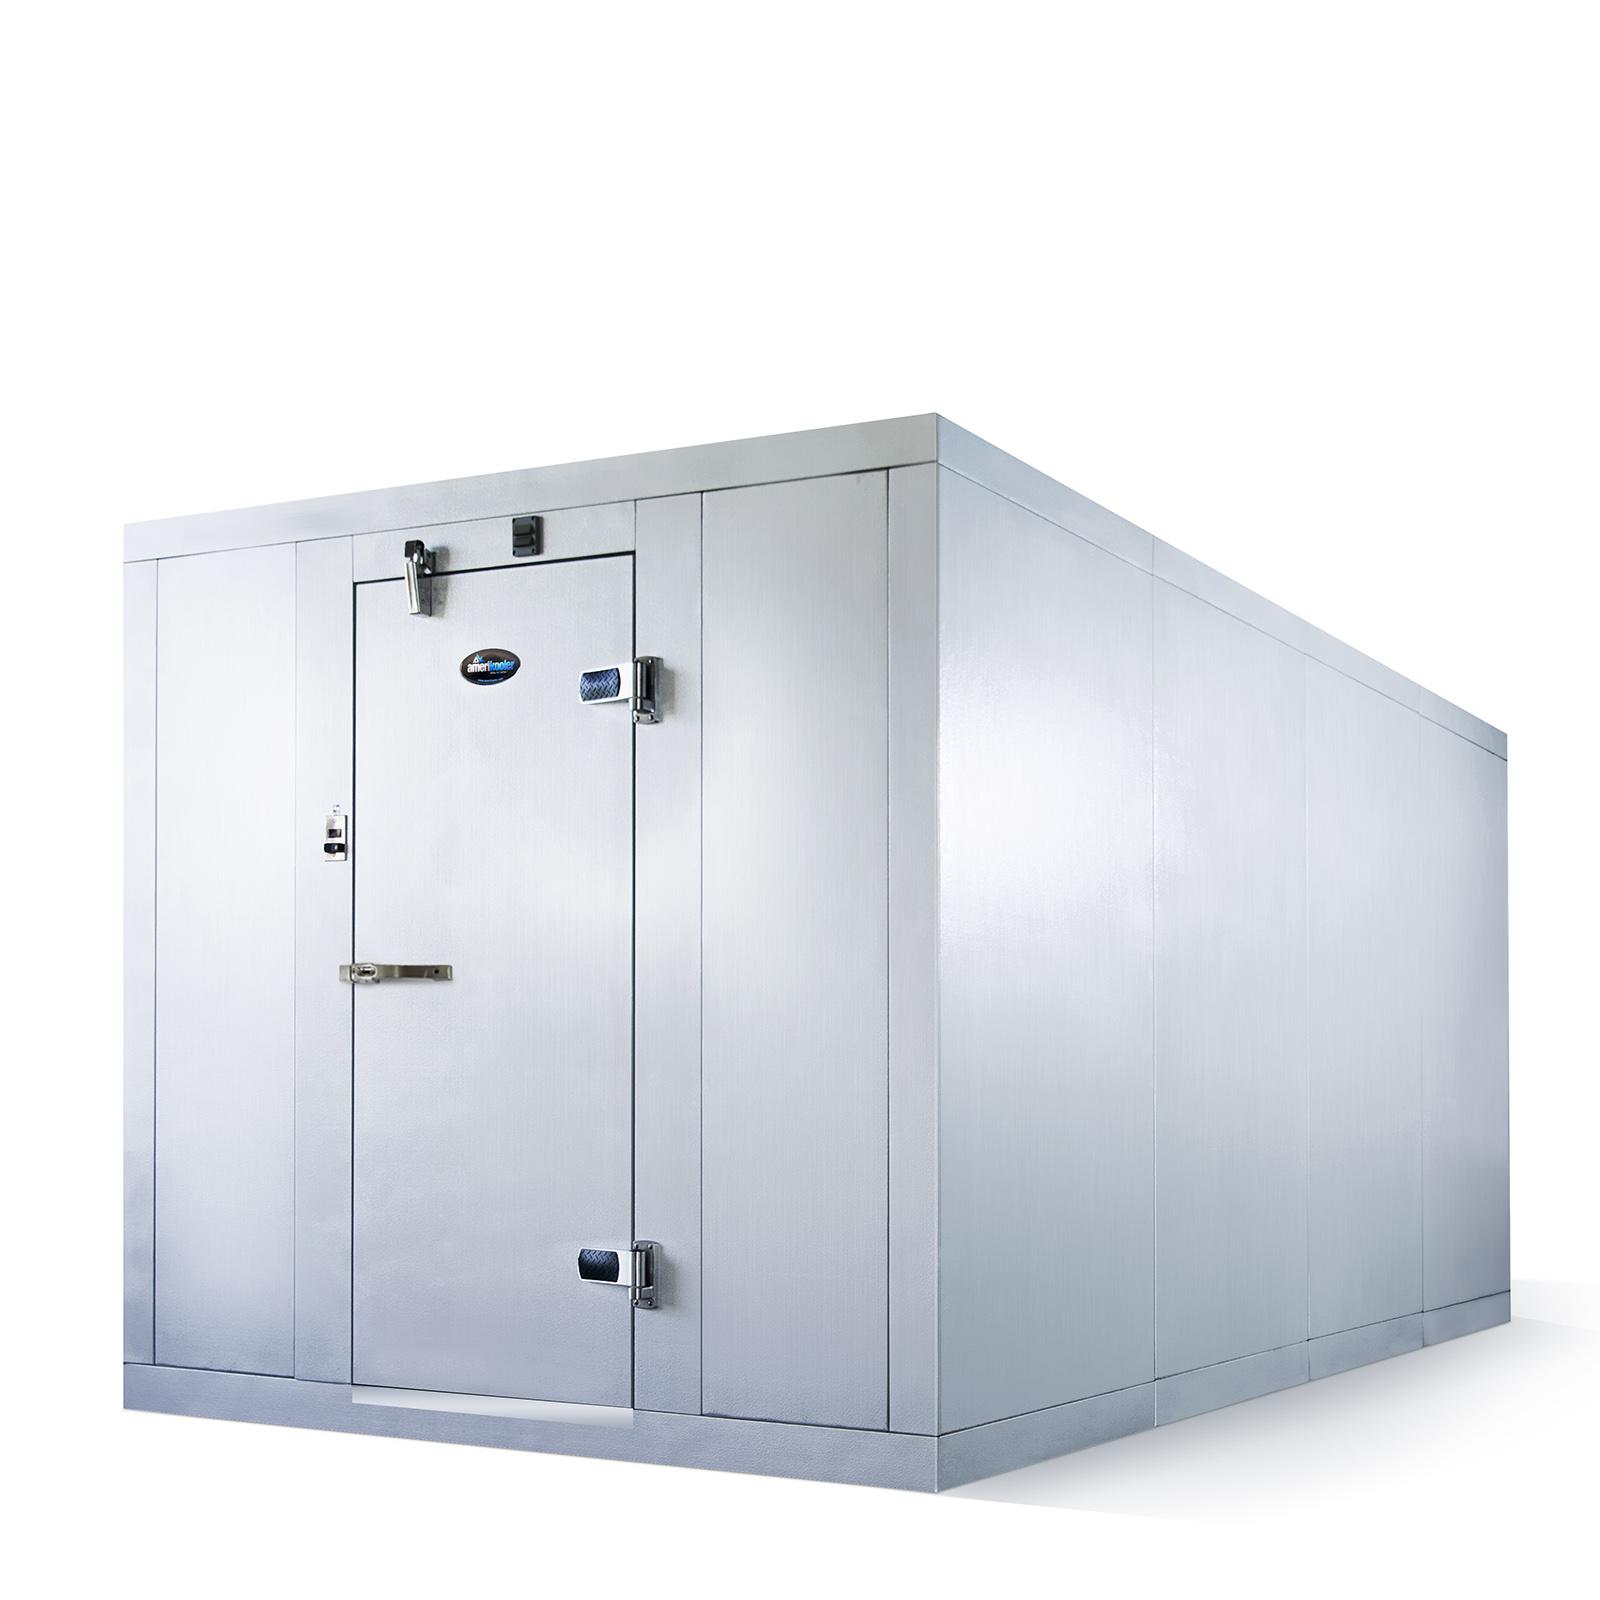 AmeriKooler DF121277**FBRM walk in freezer, modular, remote